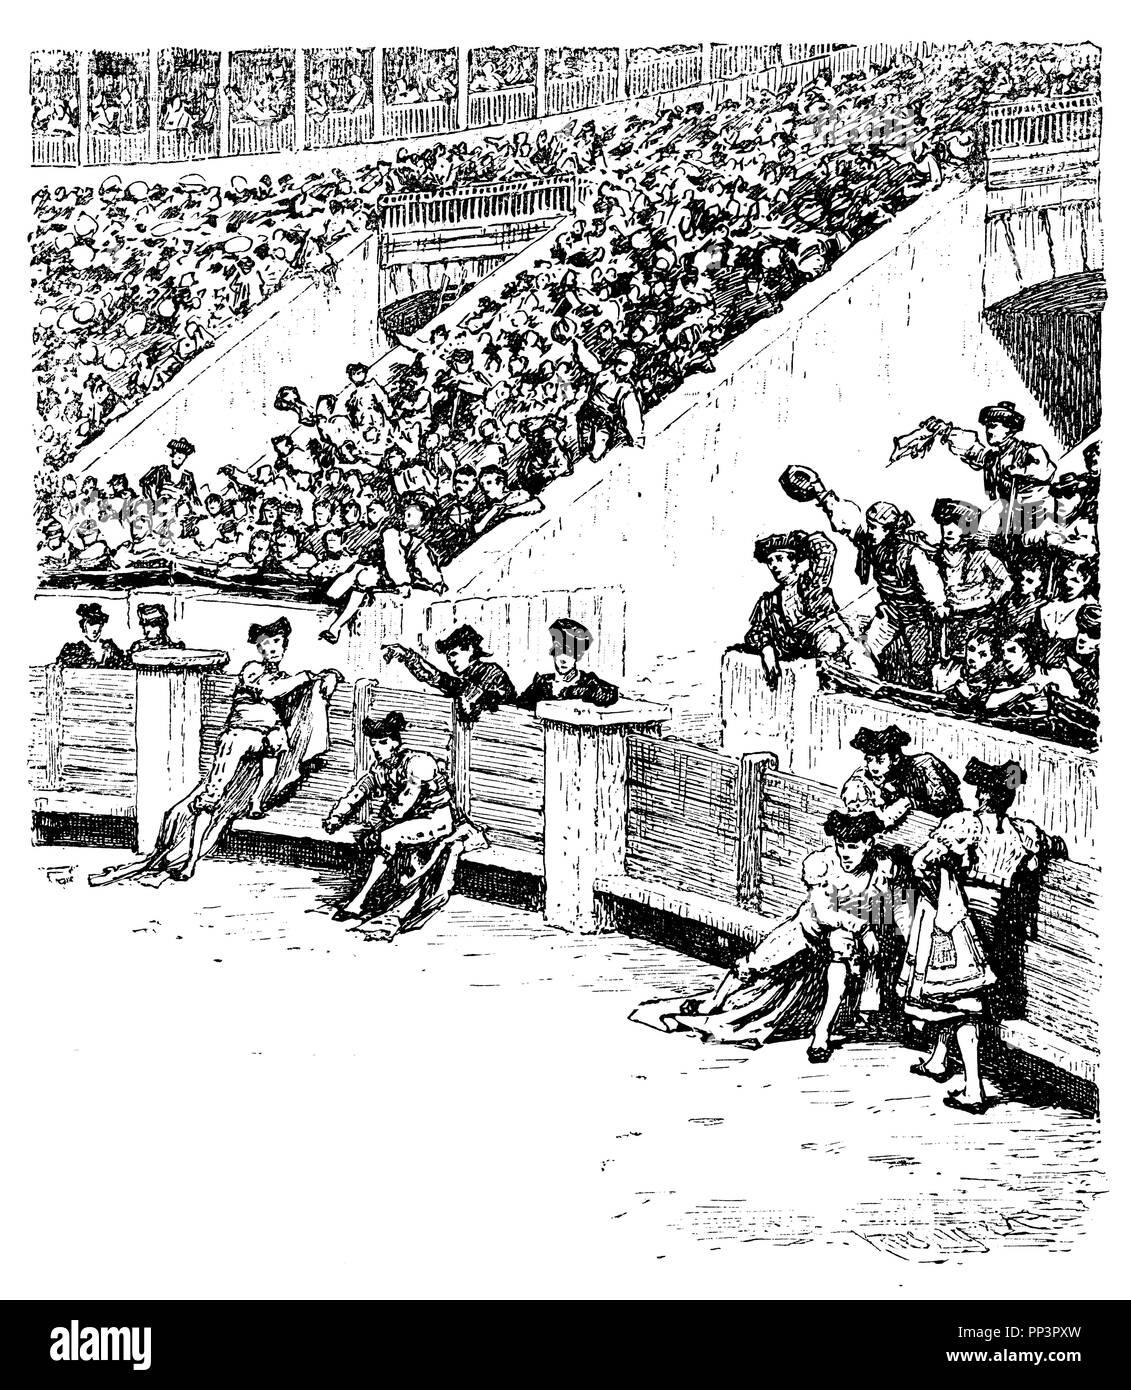 Bullfighting: Arena with spectators, Stock Photo